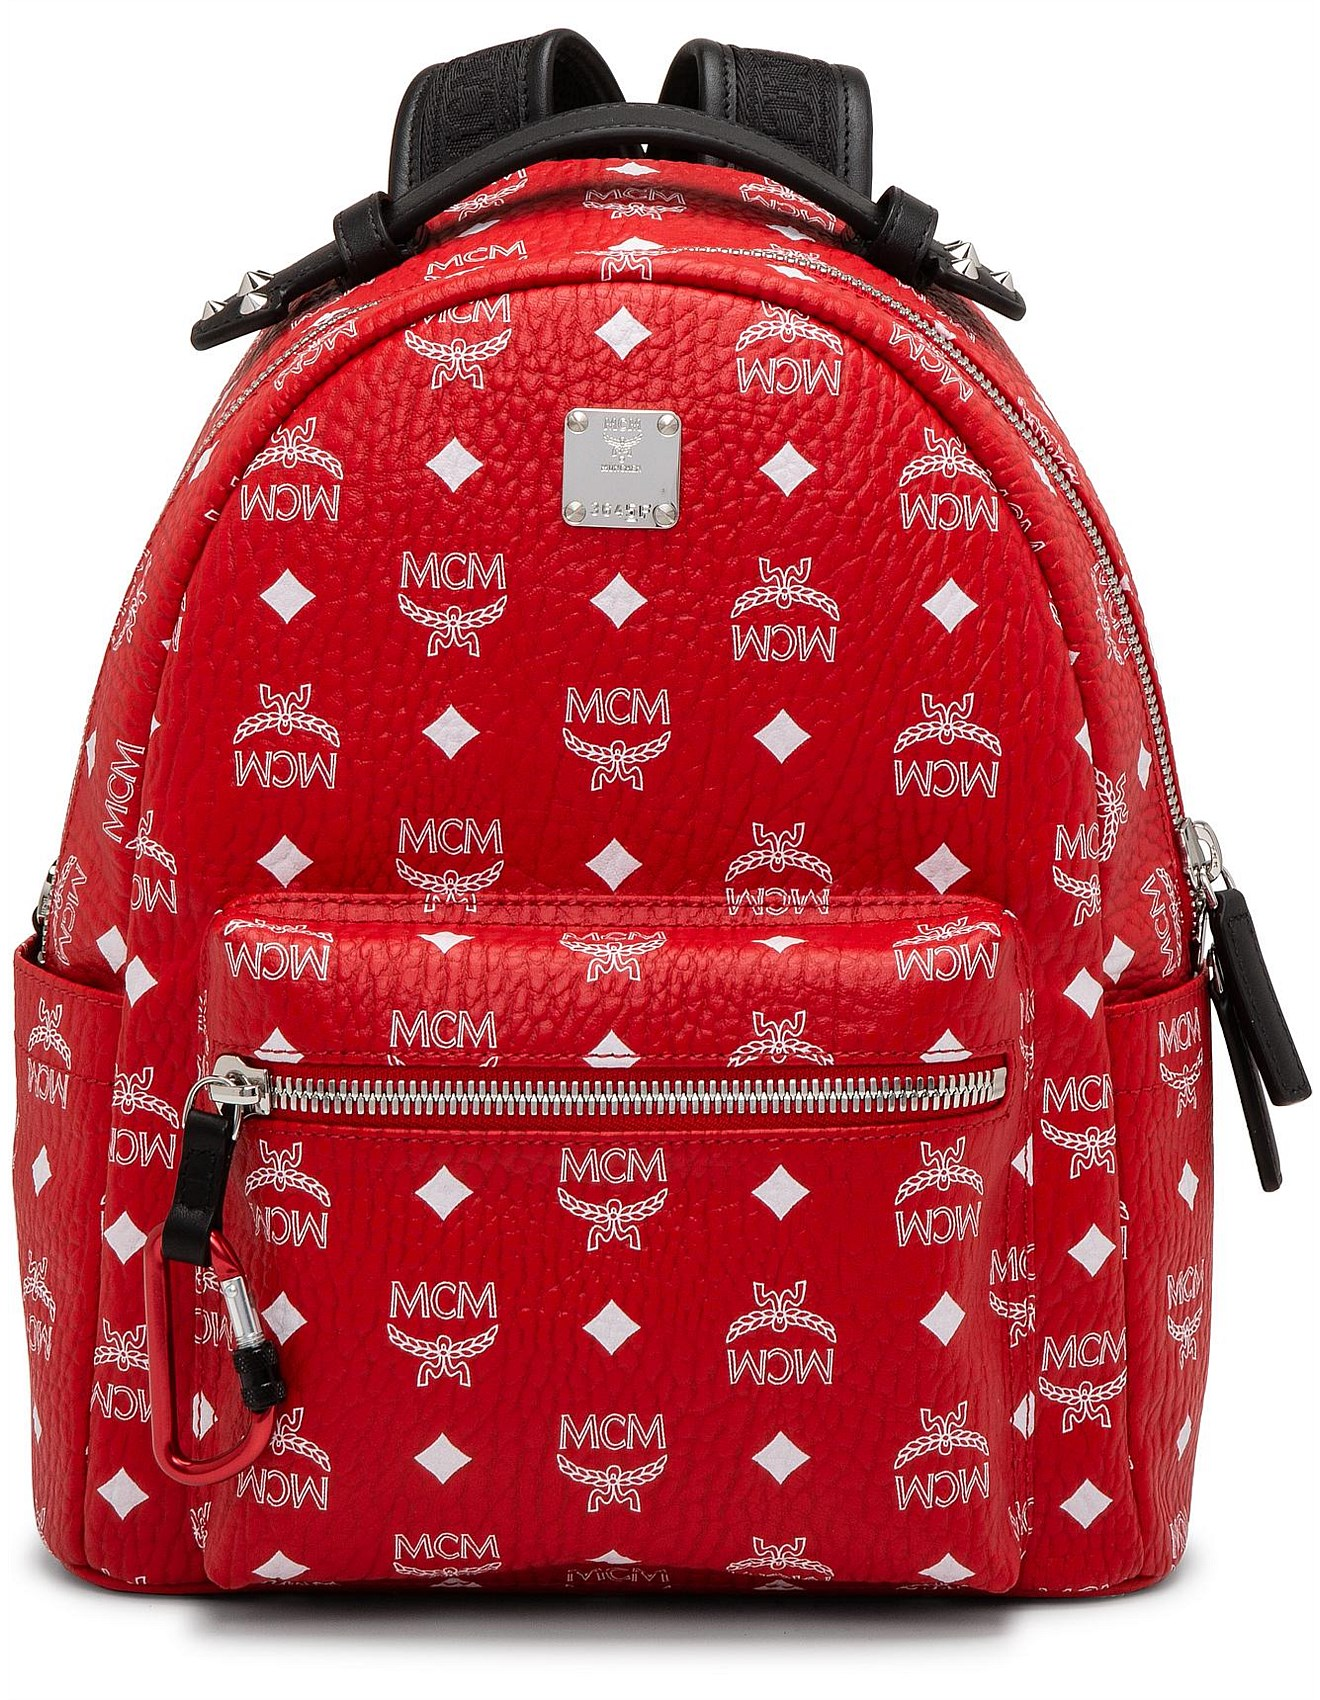 95fee7add Womens Bags - STARK WHITE LOGO VISETOS SML BACKPACK